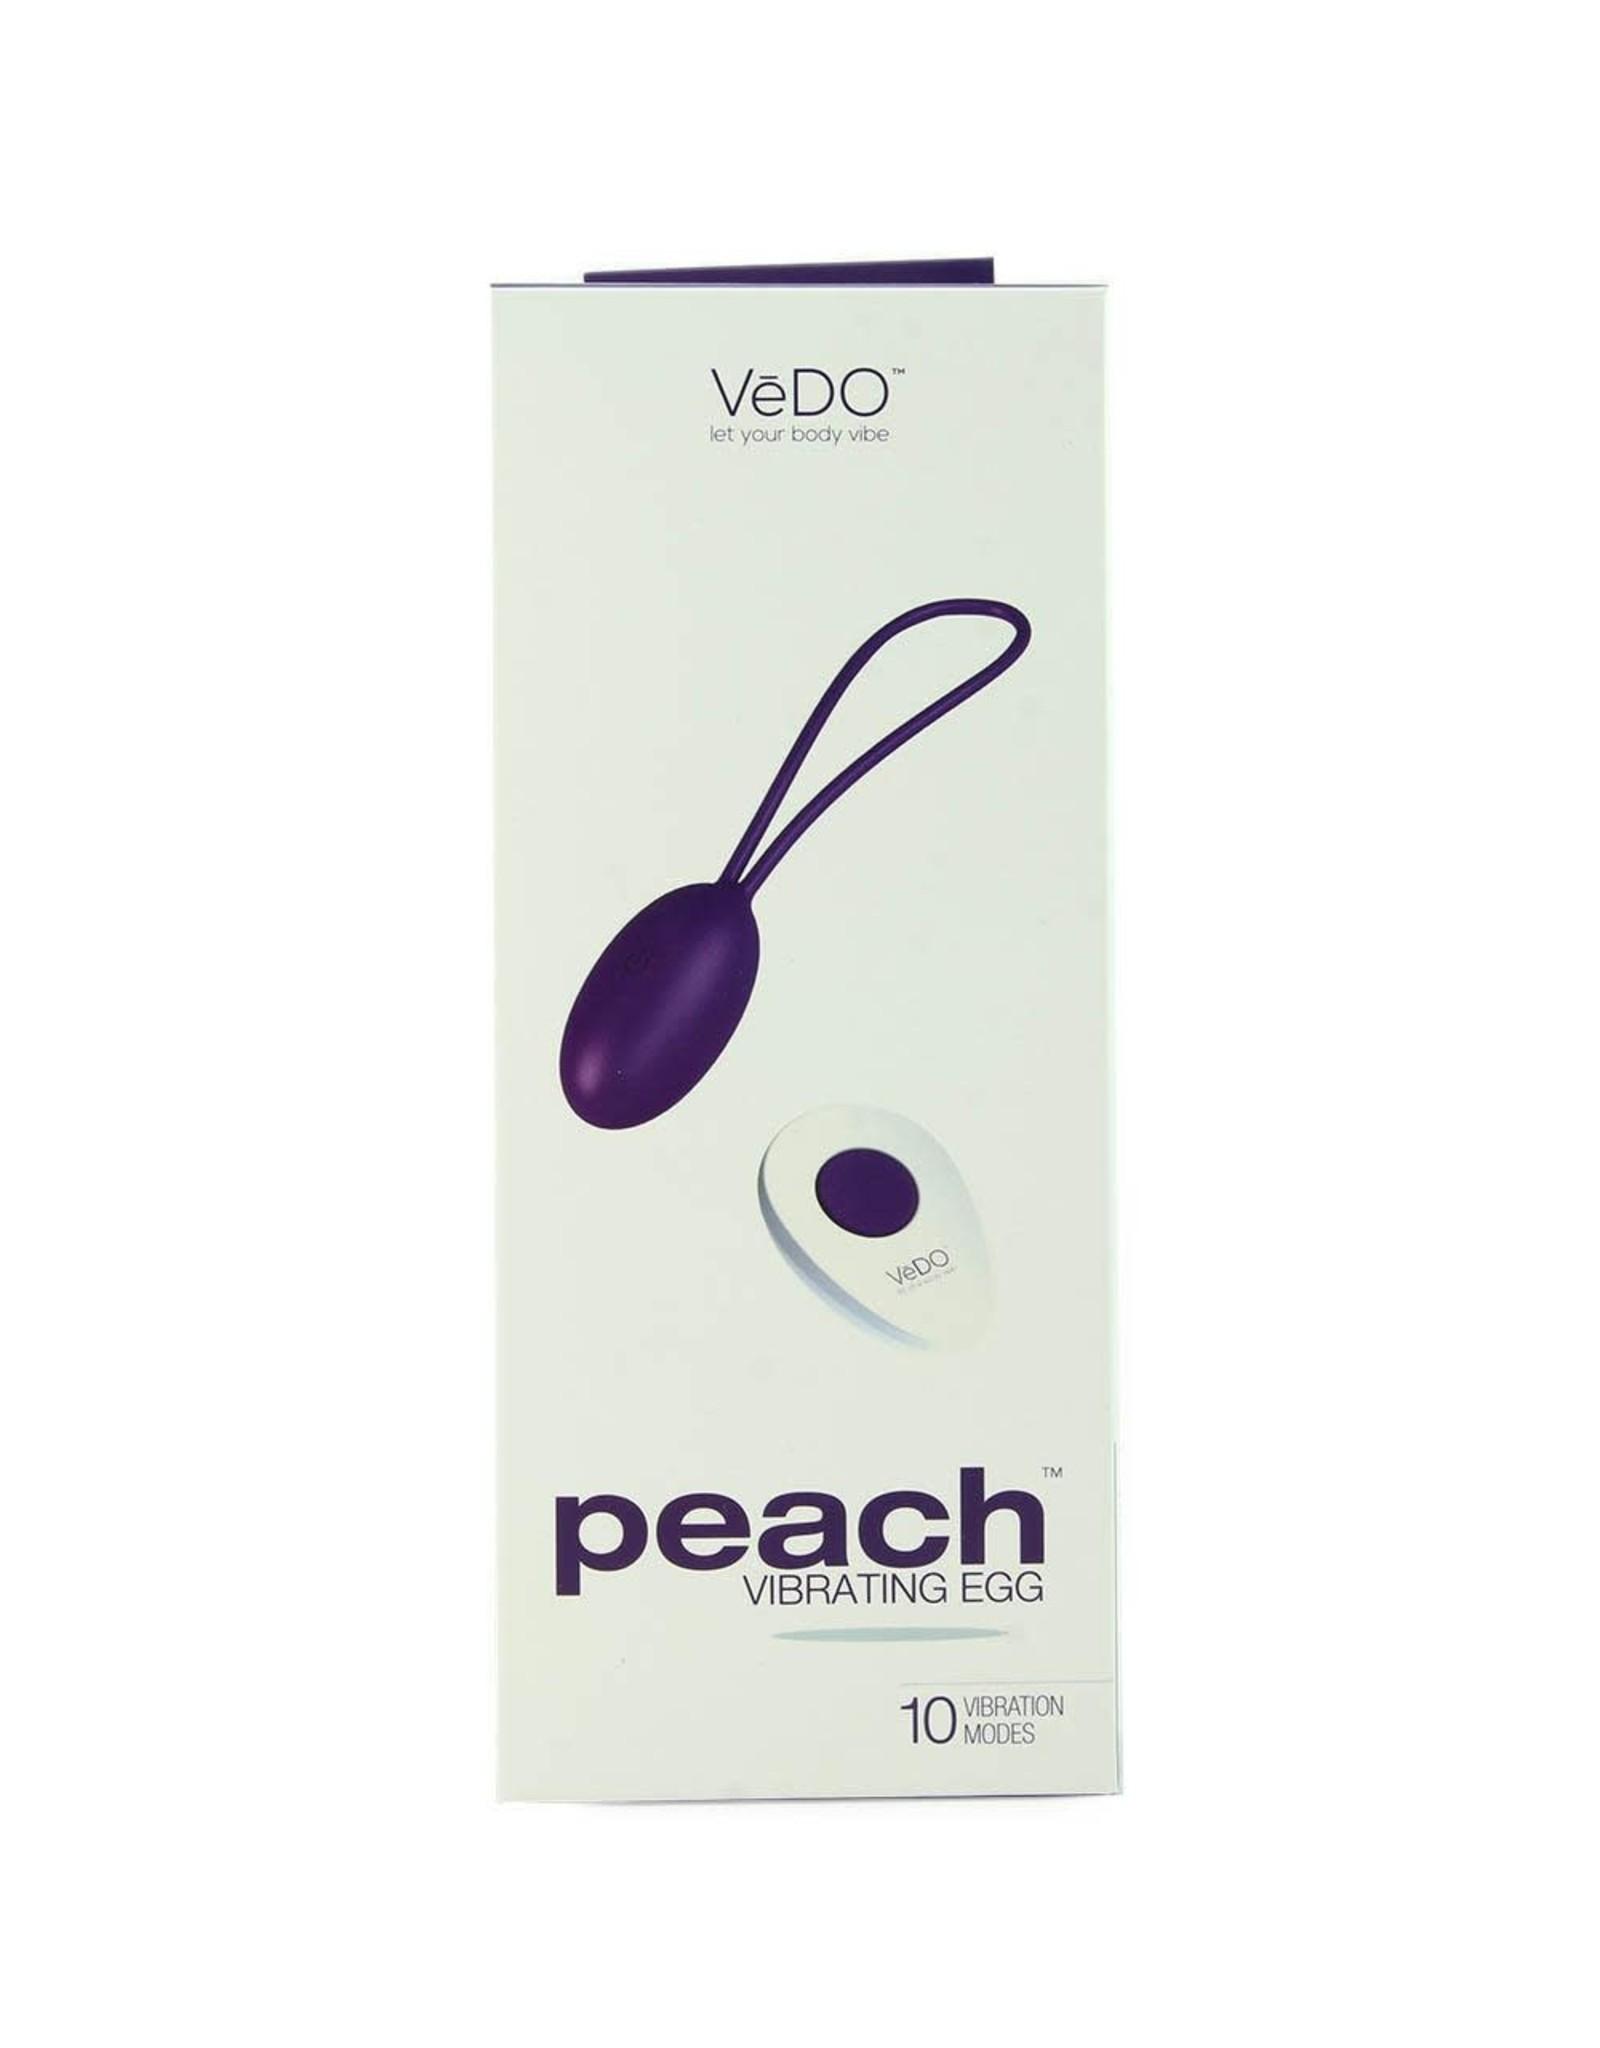 VEDO - PEACH REMOTE VIBRATING EGG - IN TO YOU INDIGO